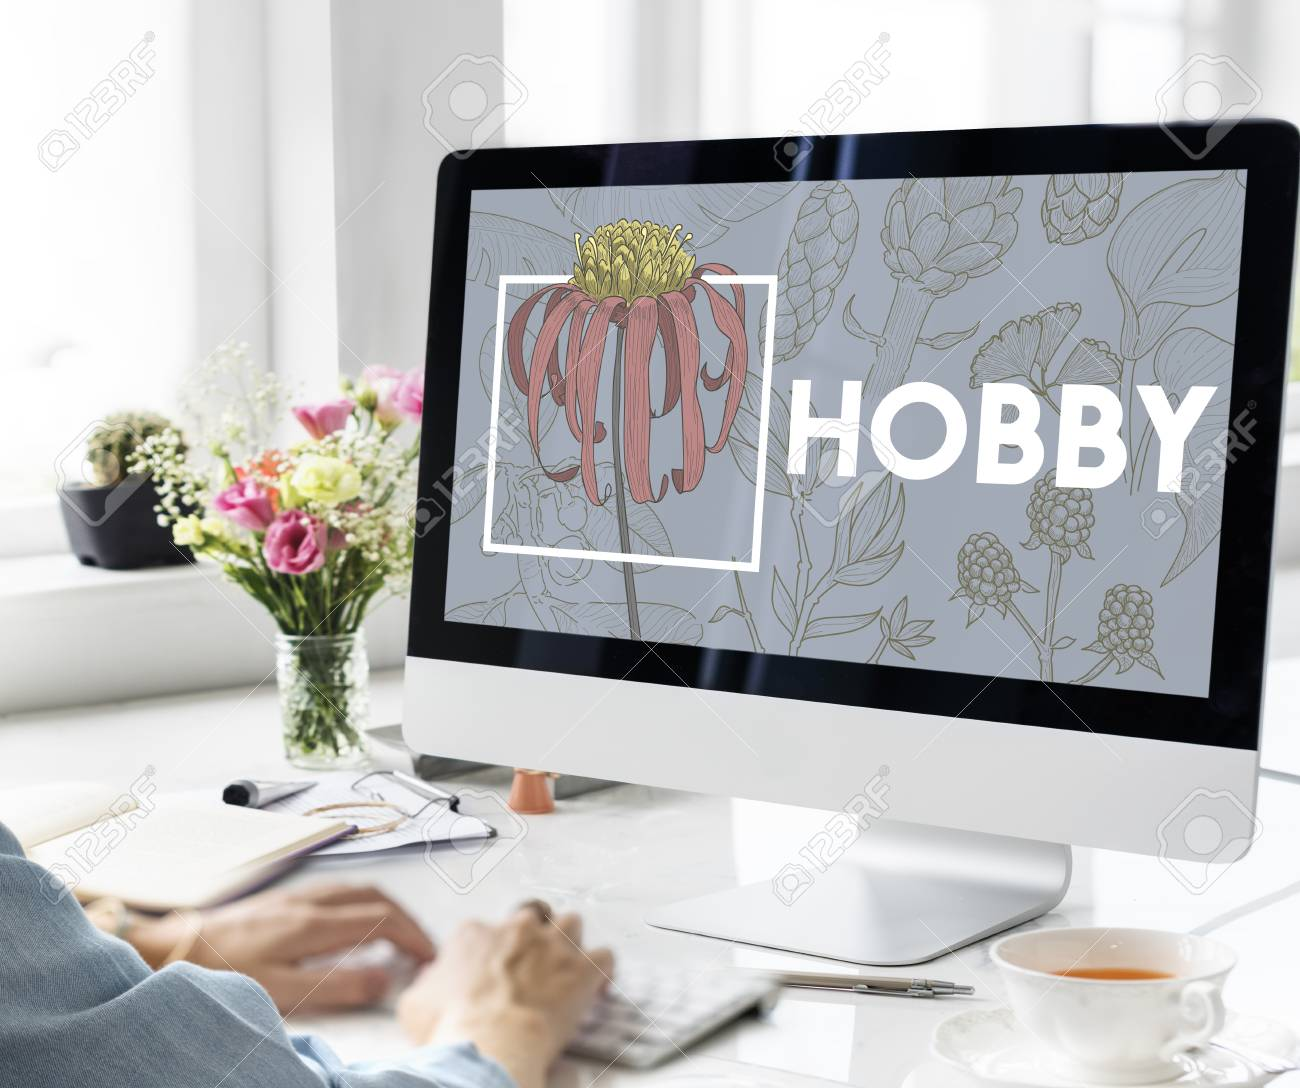 Design Creation Leisure Hobby Ideas Objective Stock Photo - 78476496